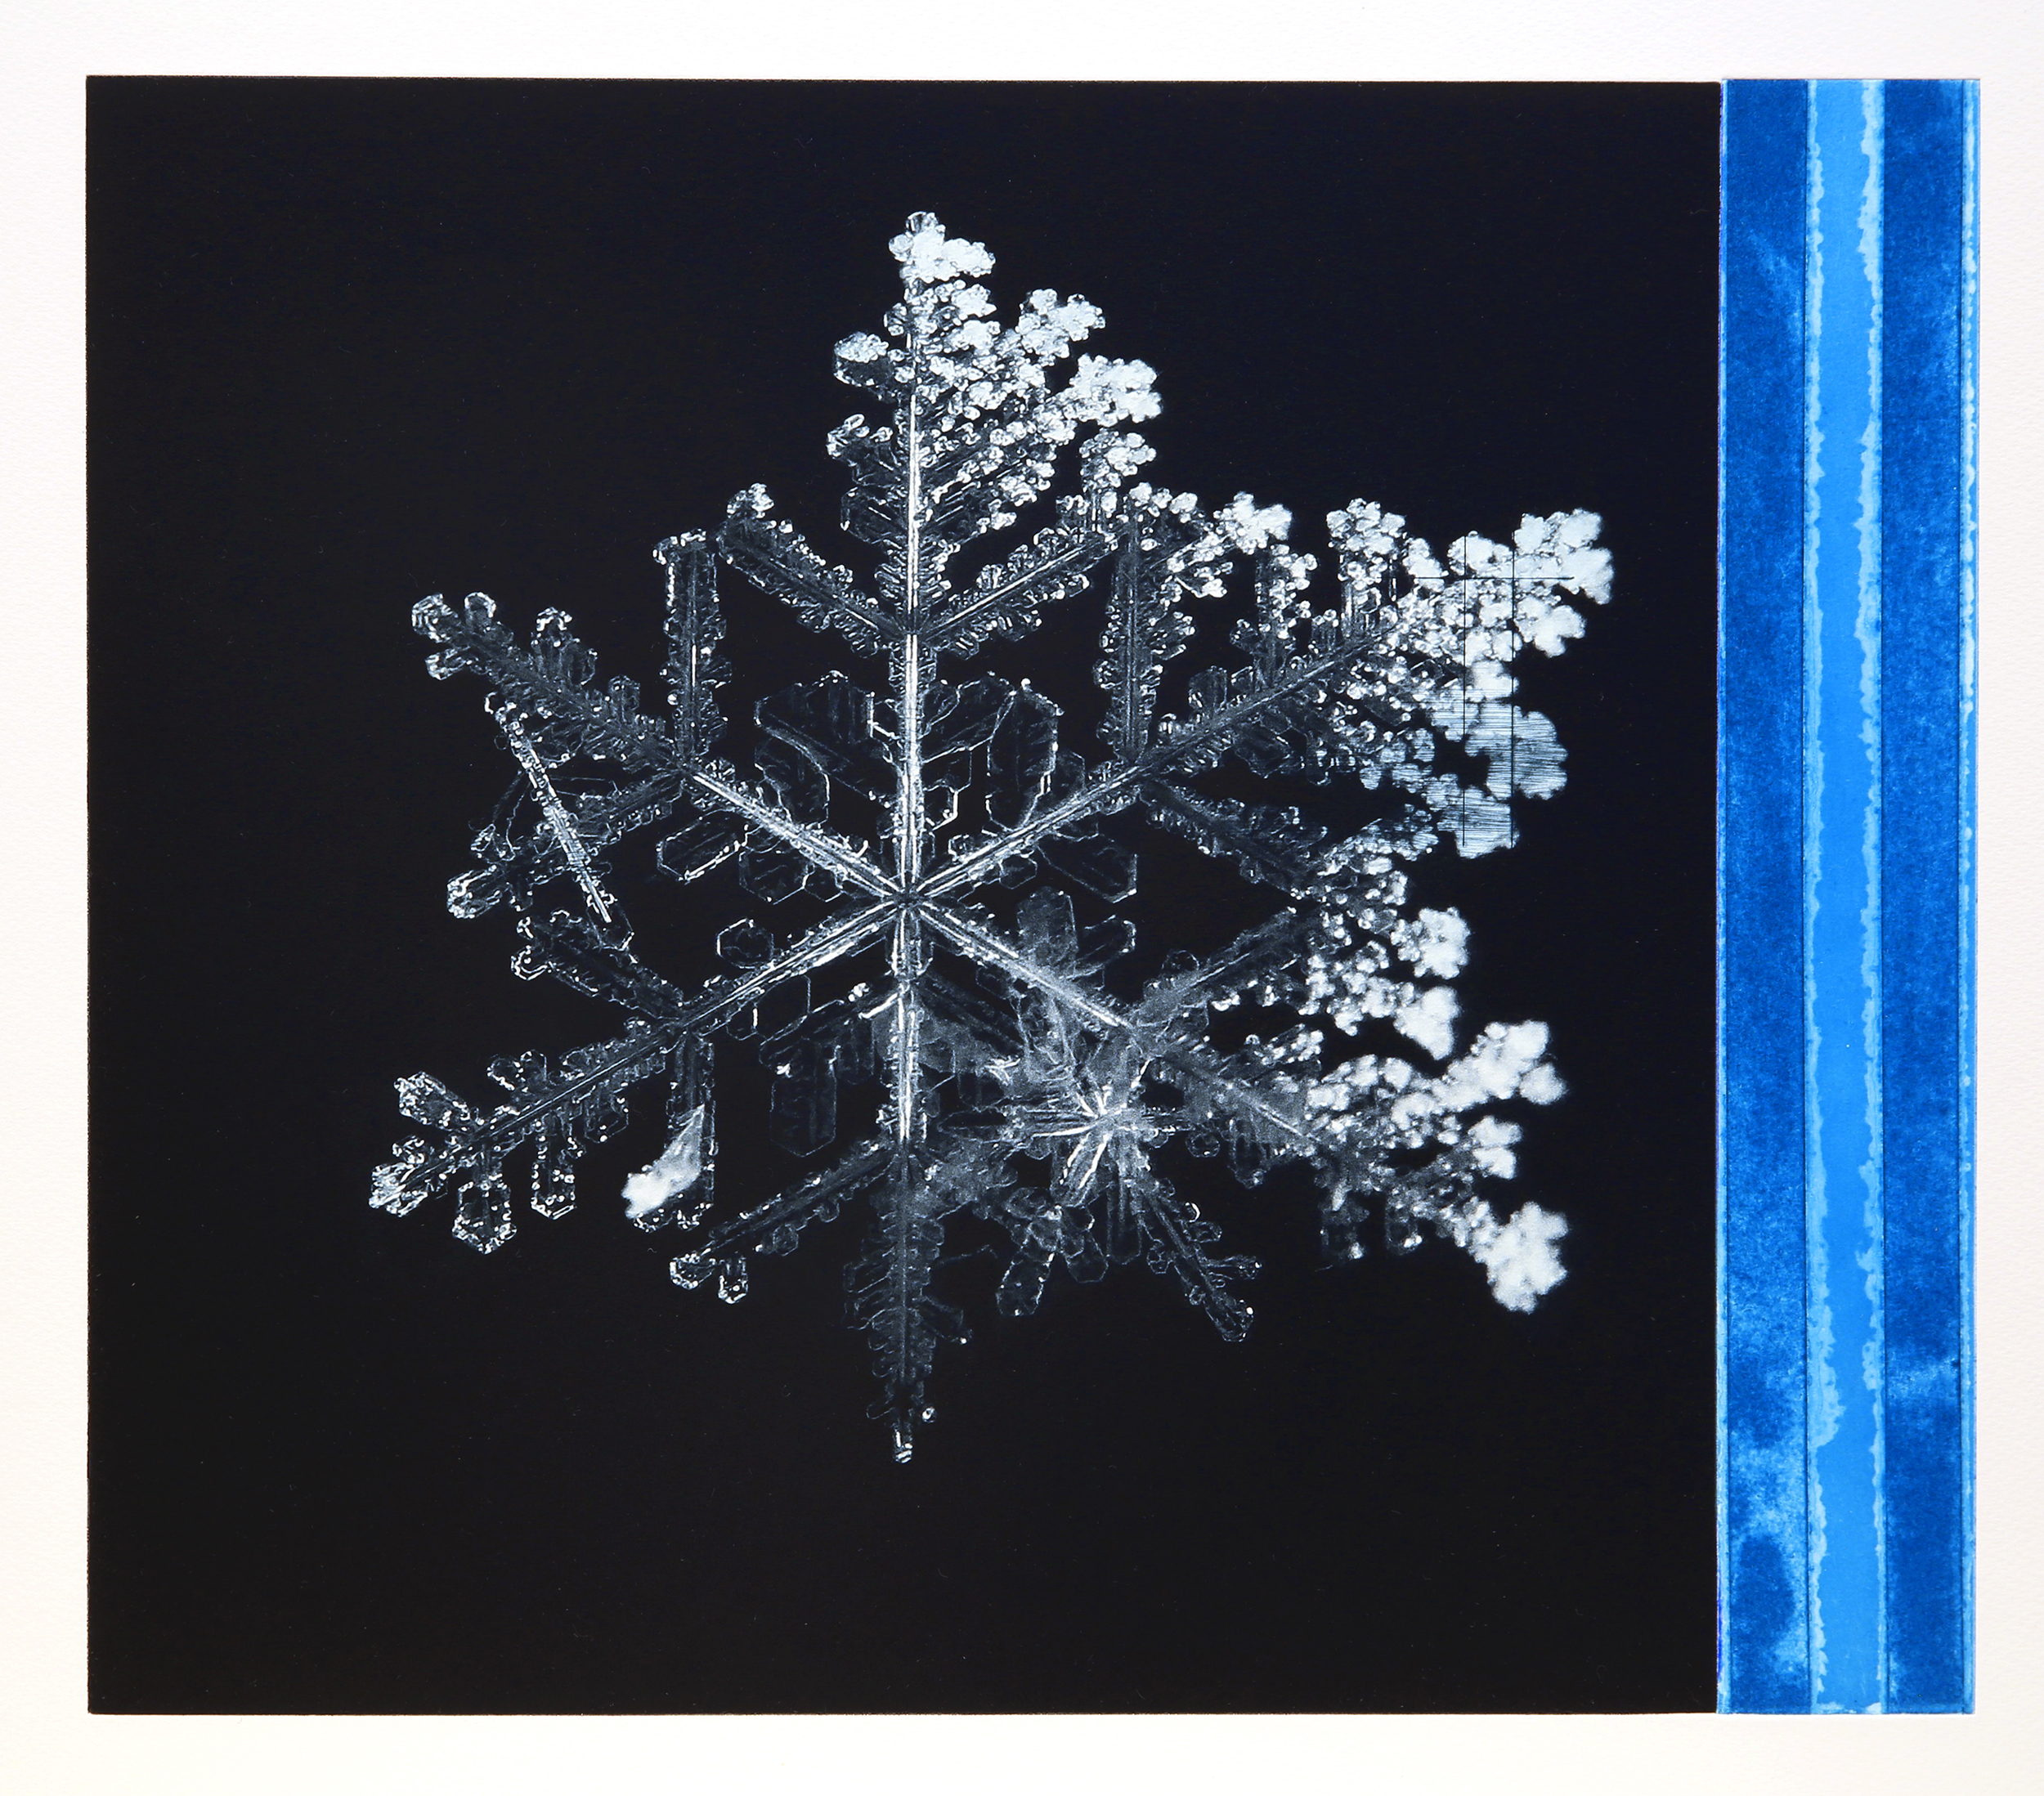 Crystal / Reservoir (Tesla) Phalo Blue  Polymer / Etching / Drypoint 40 x 45 cm / 15,7 x 17,7 in Edition of 40 + 7 Ap Editeur: Per Fronth / Atelje Ole Larsen / Helsingborg  39/2015: